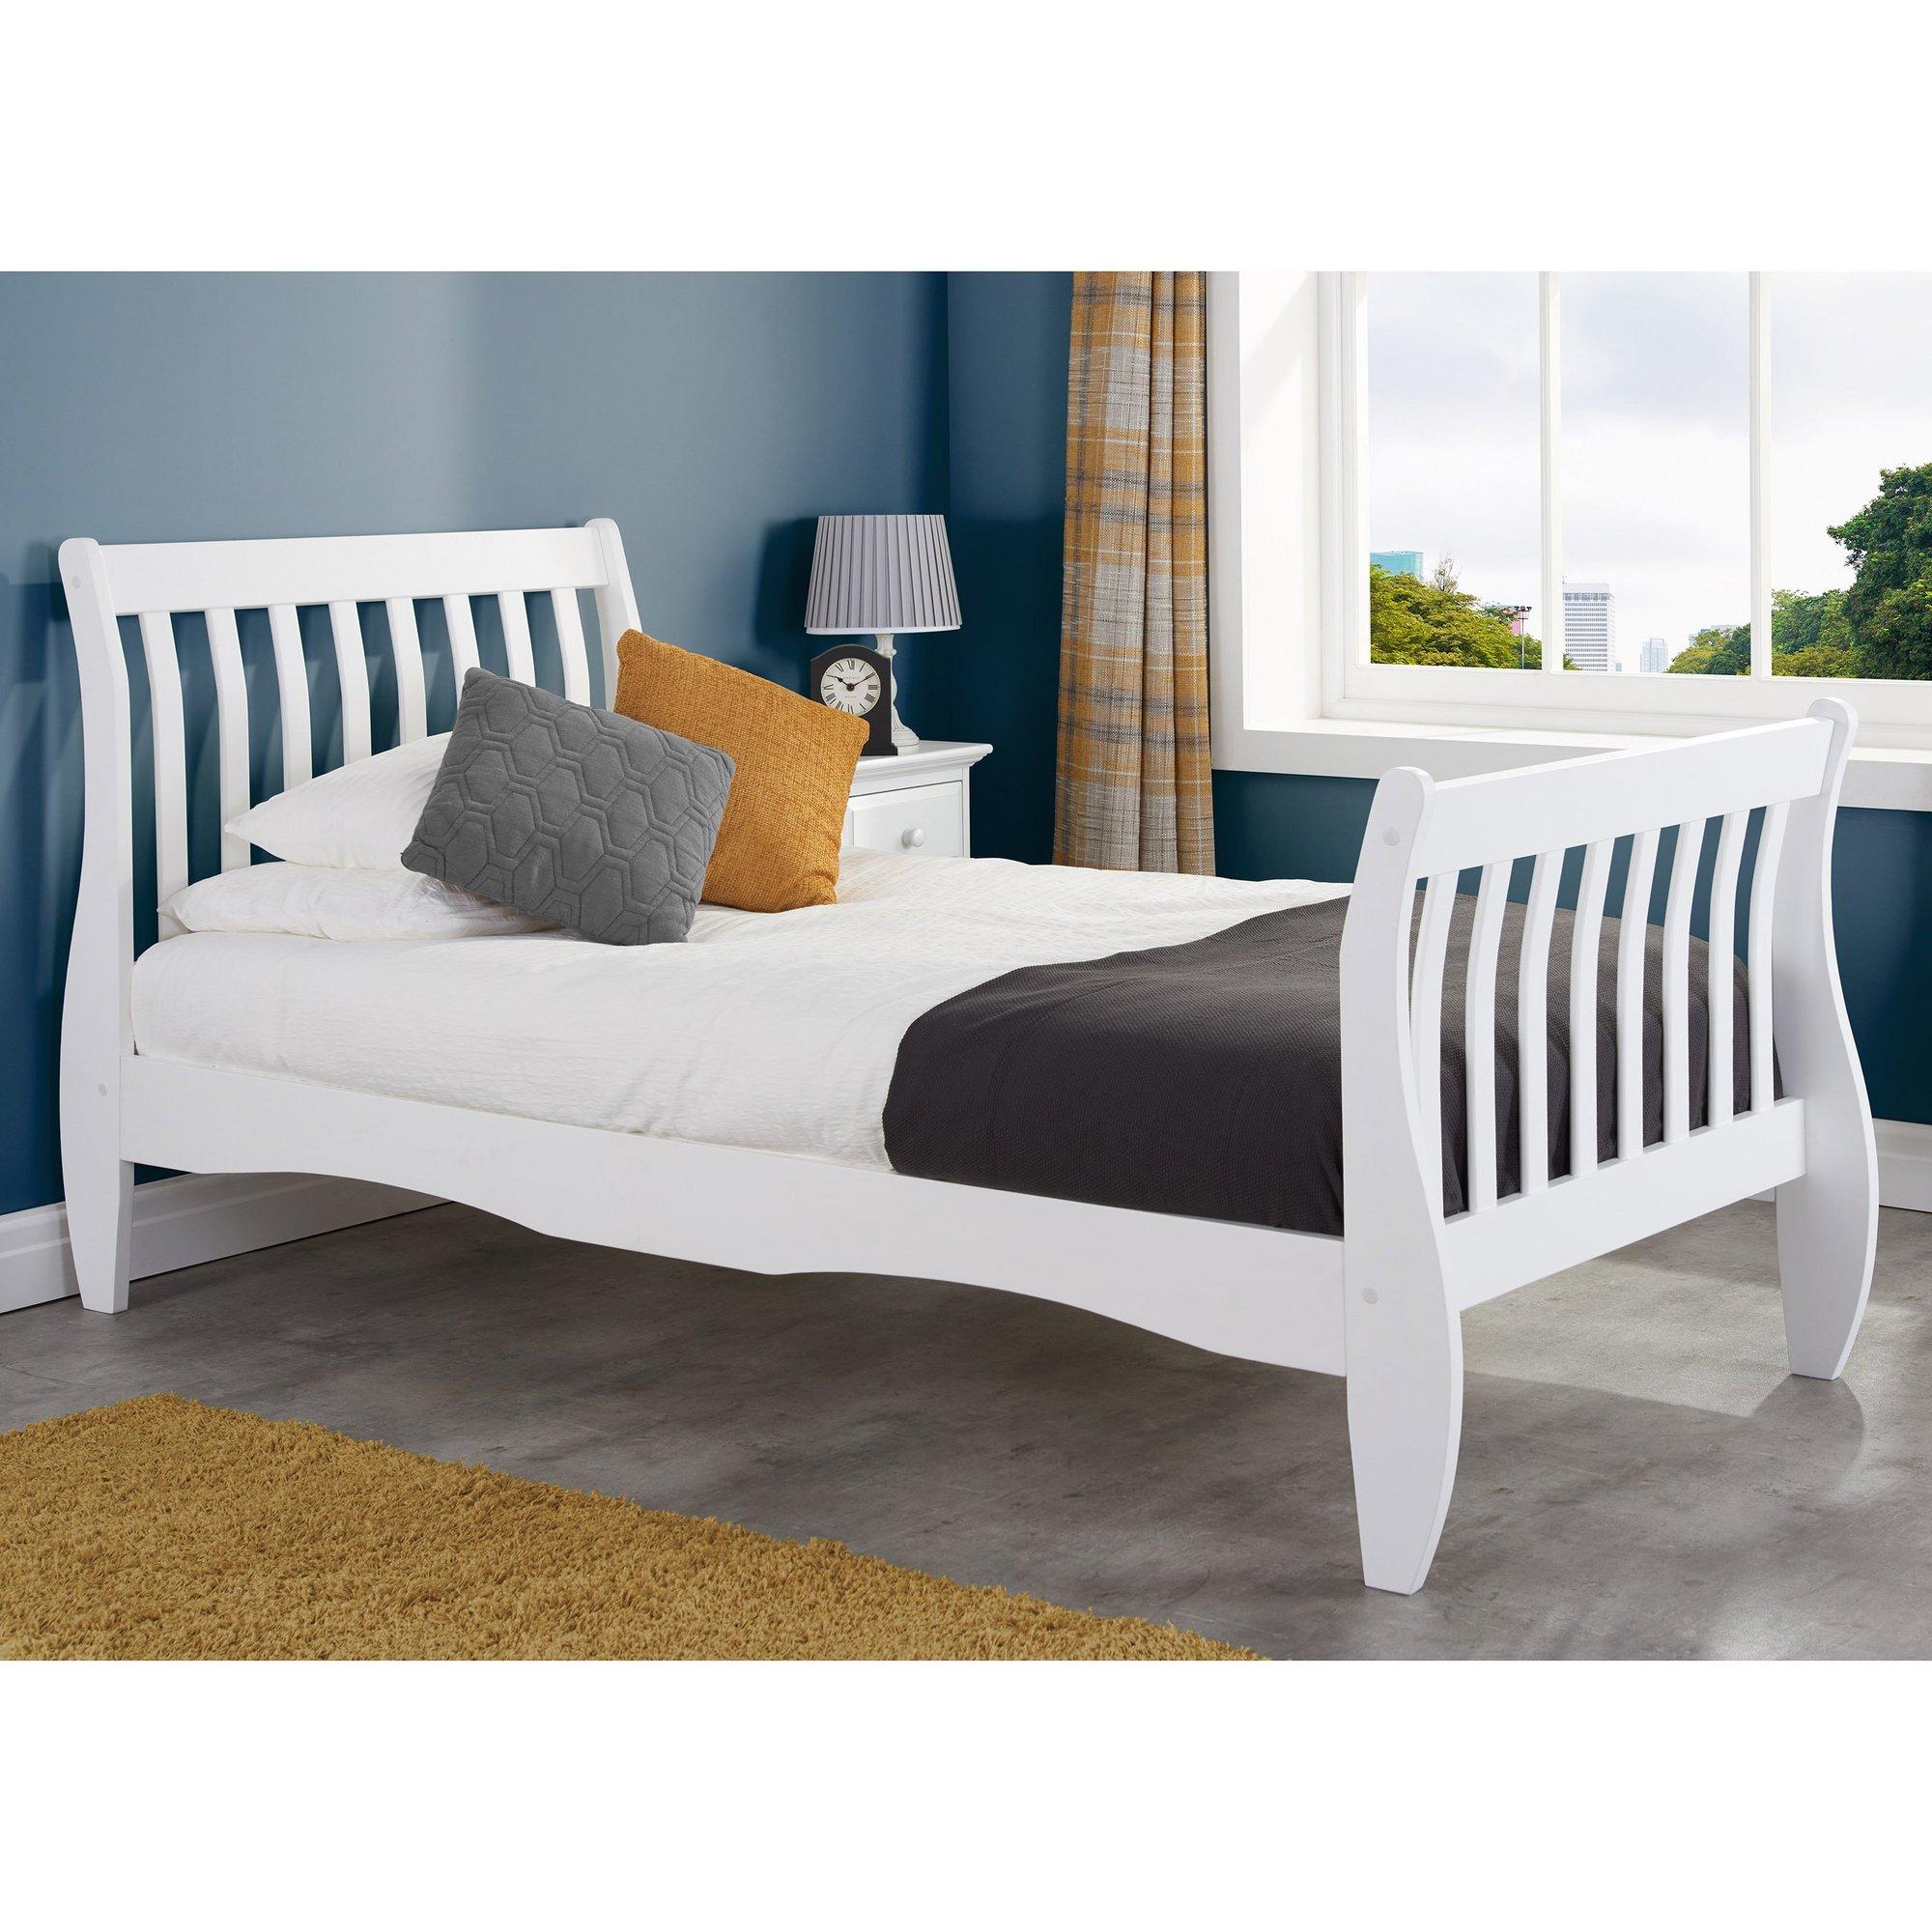 Image of Belford Bed